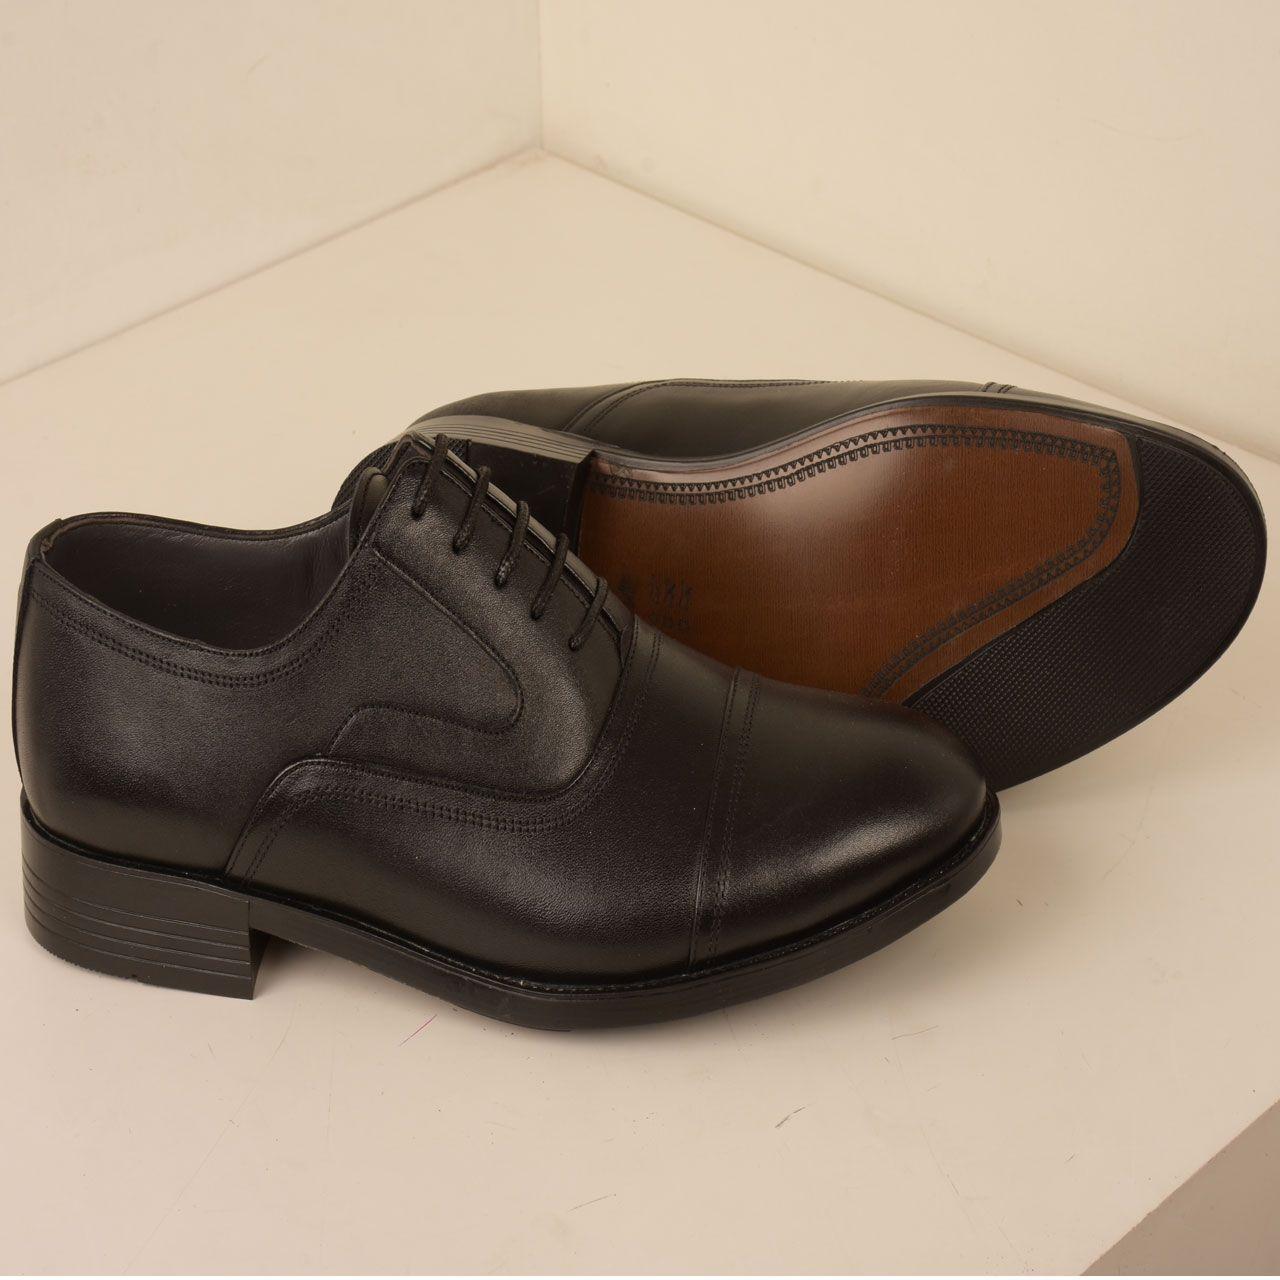 کفش مردانه پارینه چرم مدل SHO178 -  - 5